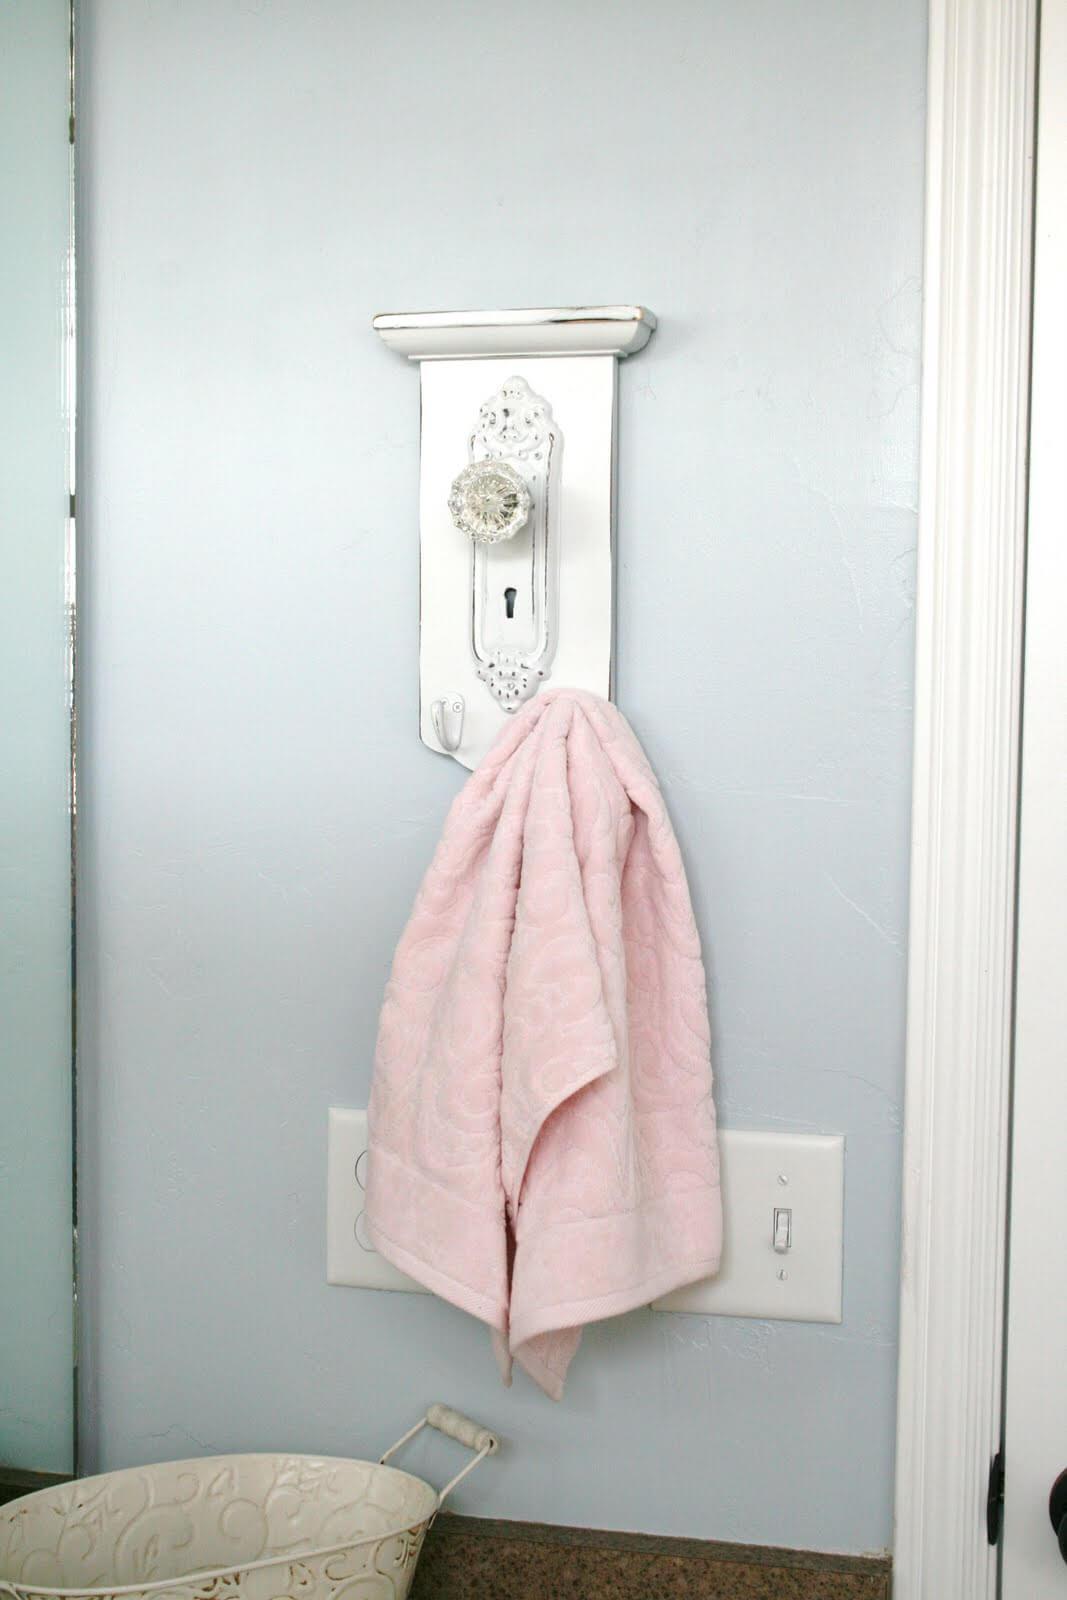 Rustic Elegant Decorative Towel Hanger